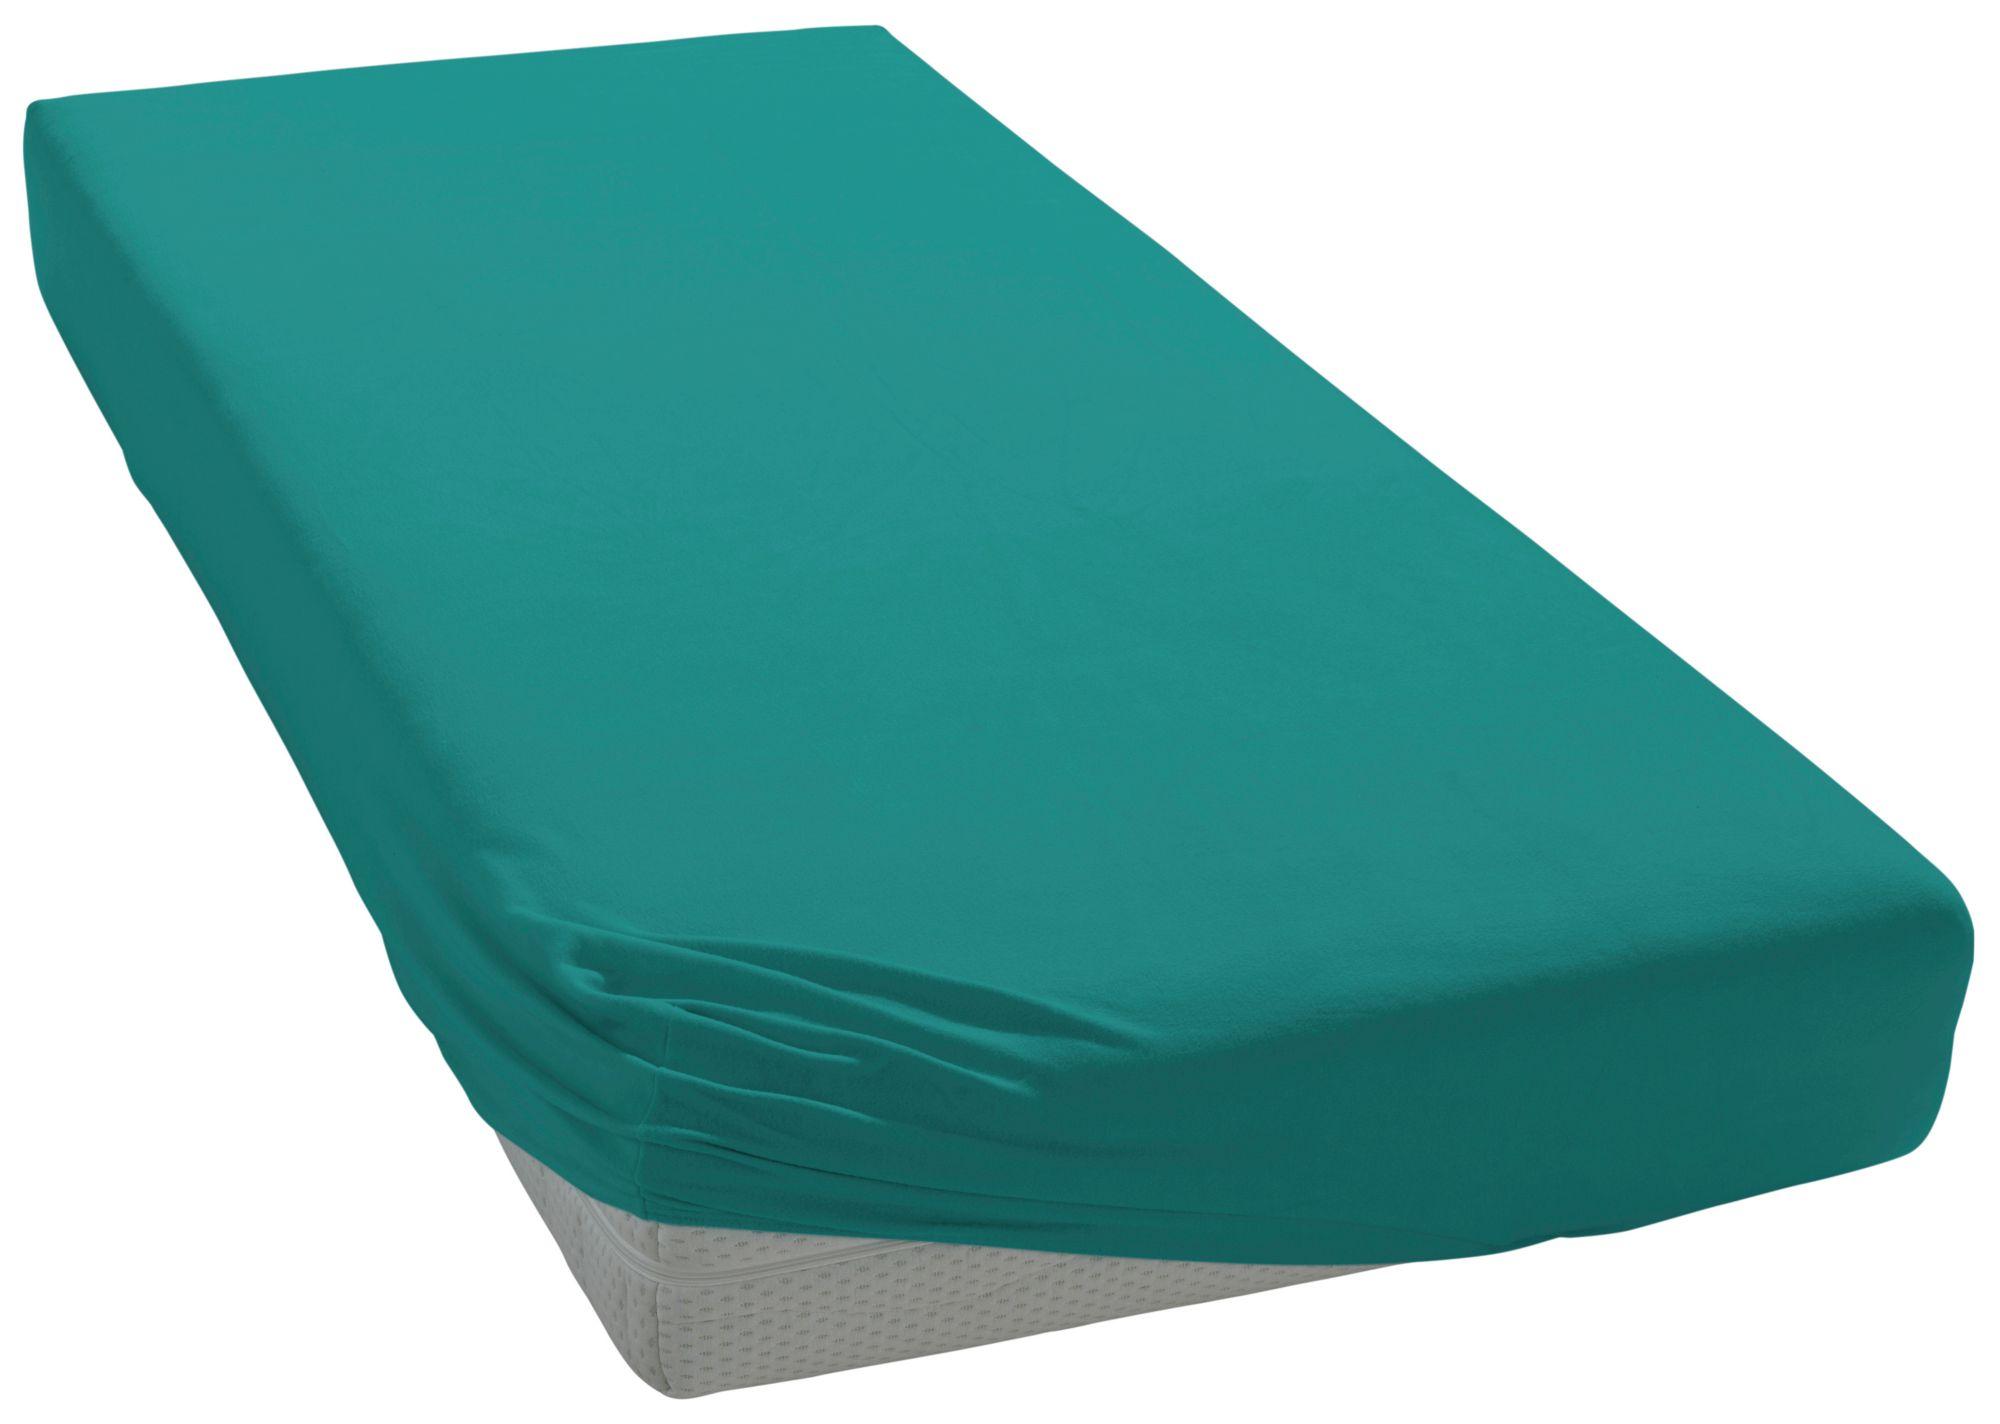 spannbettlaken auro hometextile mako satin basic uni. Black Bedroom Furniture Sets. Home Design Ideas